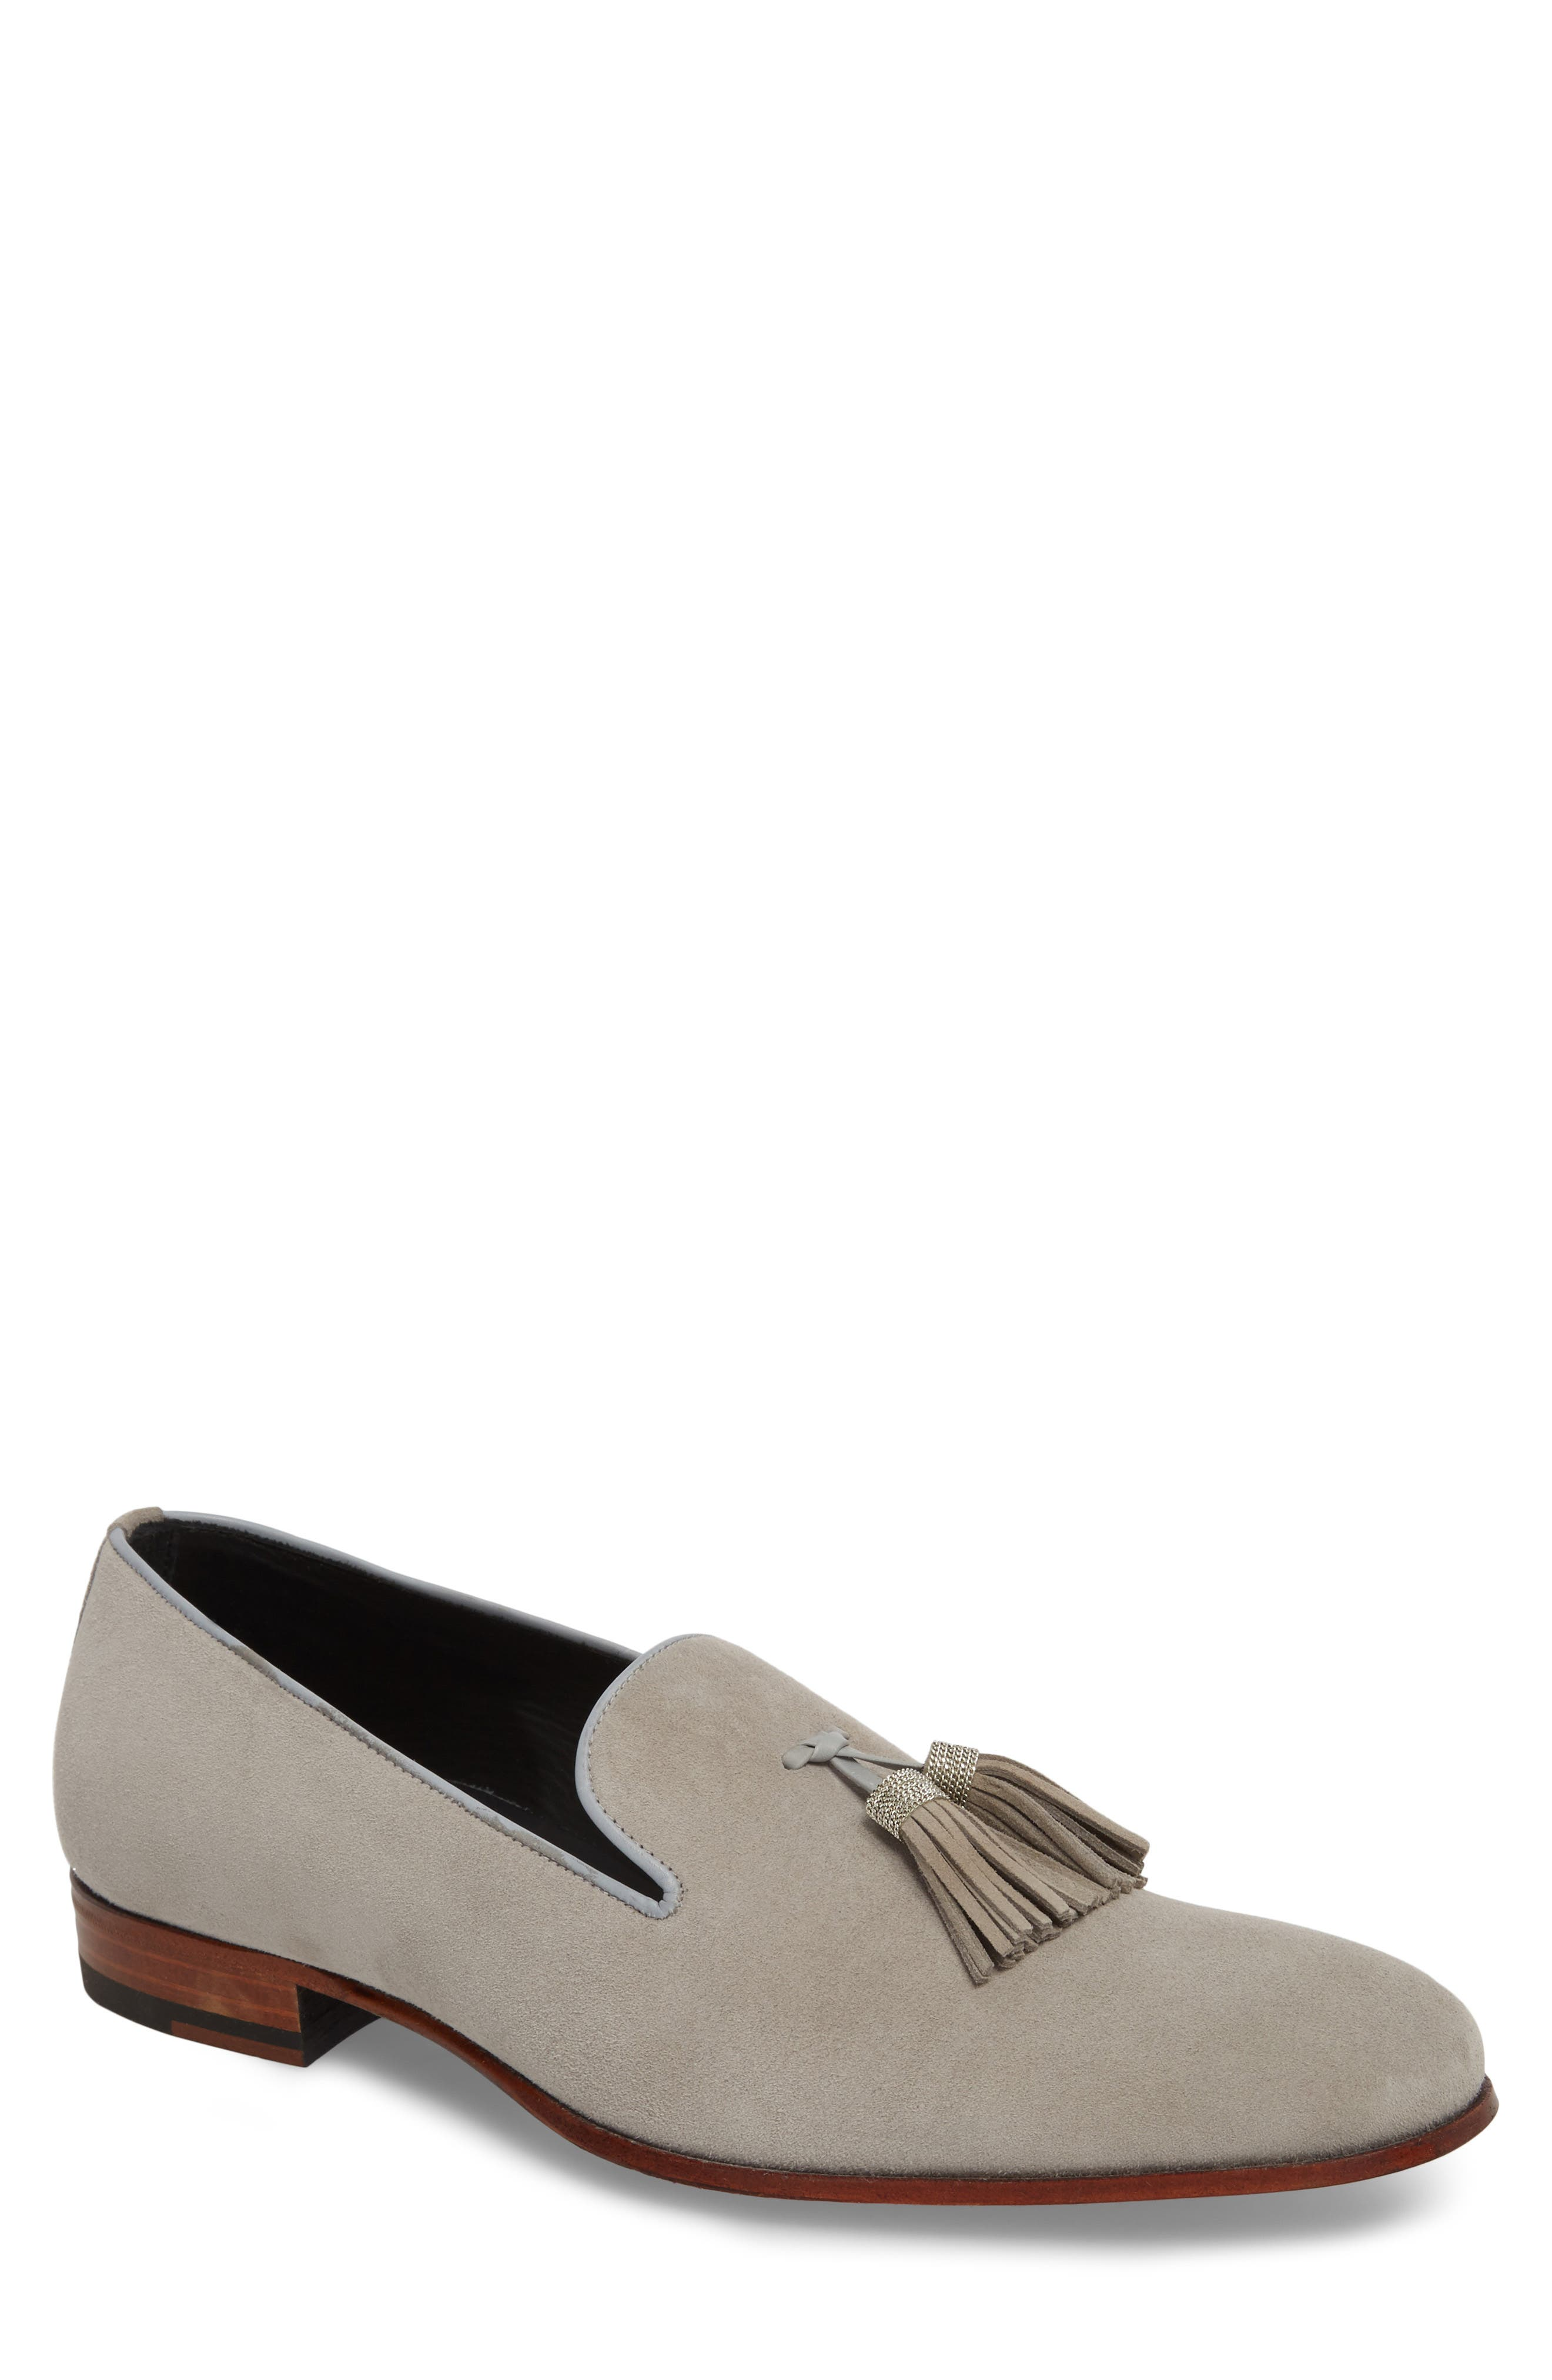 Picus Tassel Loafer,                         Main,                         color, 054